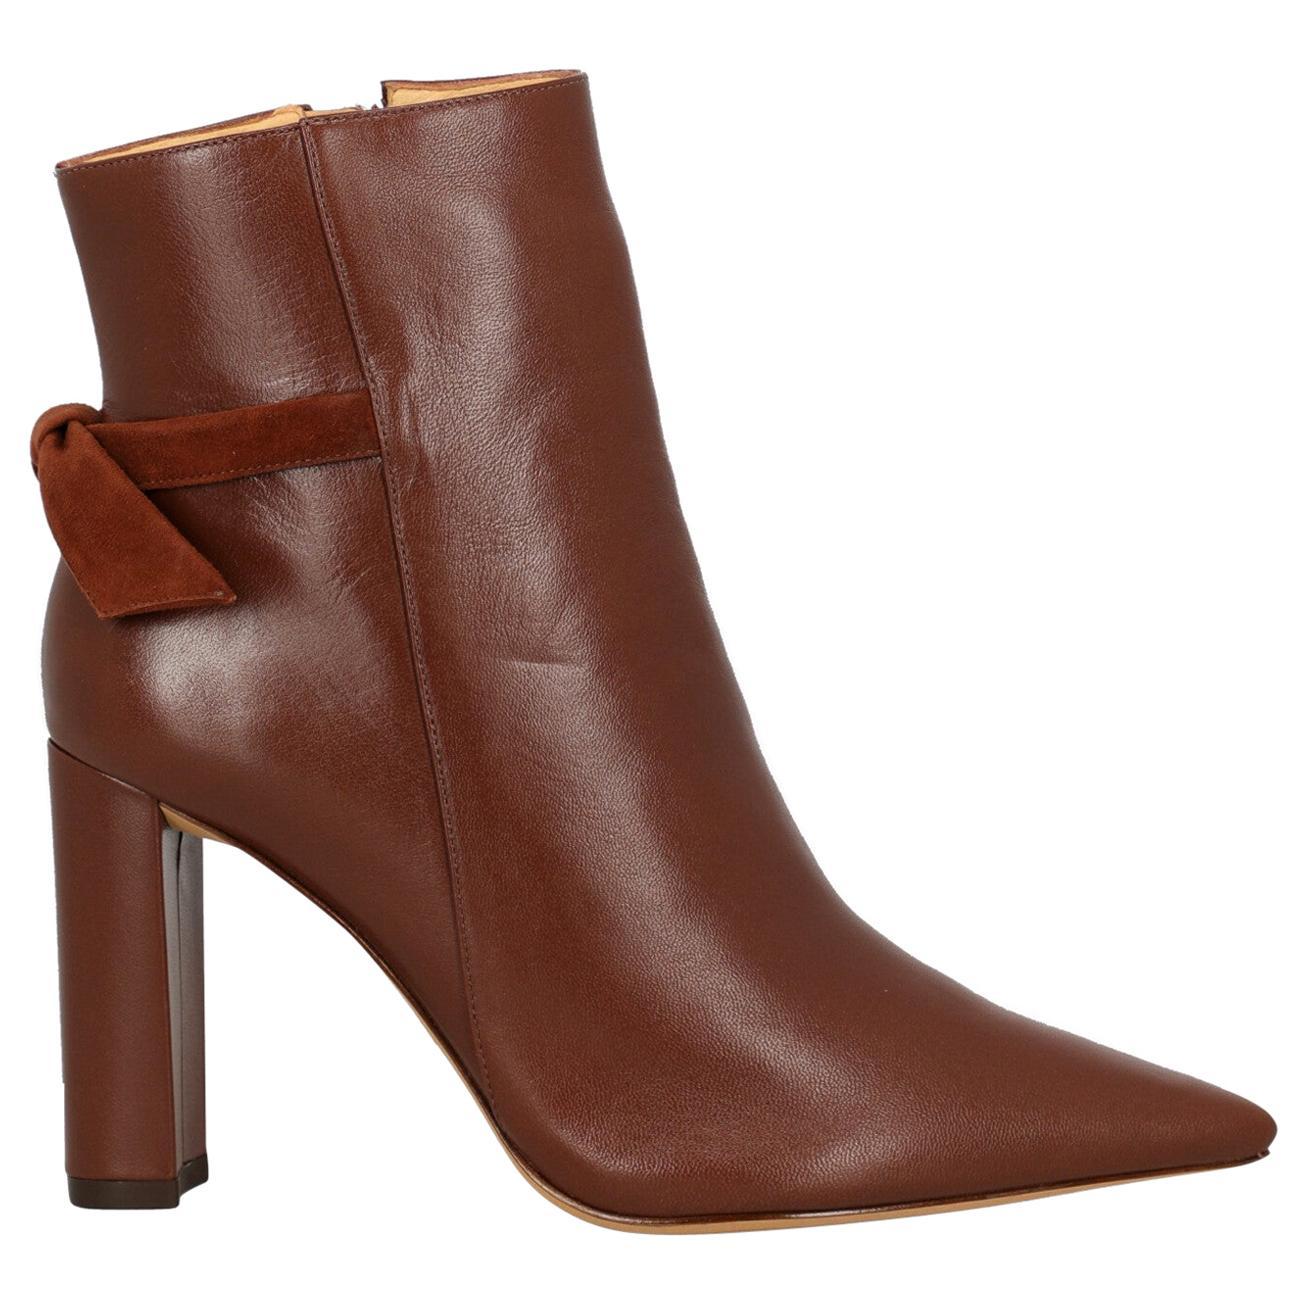 Alexandre Birman Woman Ankle boots Brown Leather IT 38.5